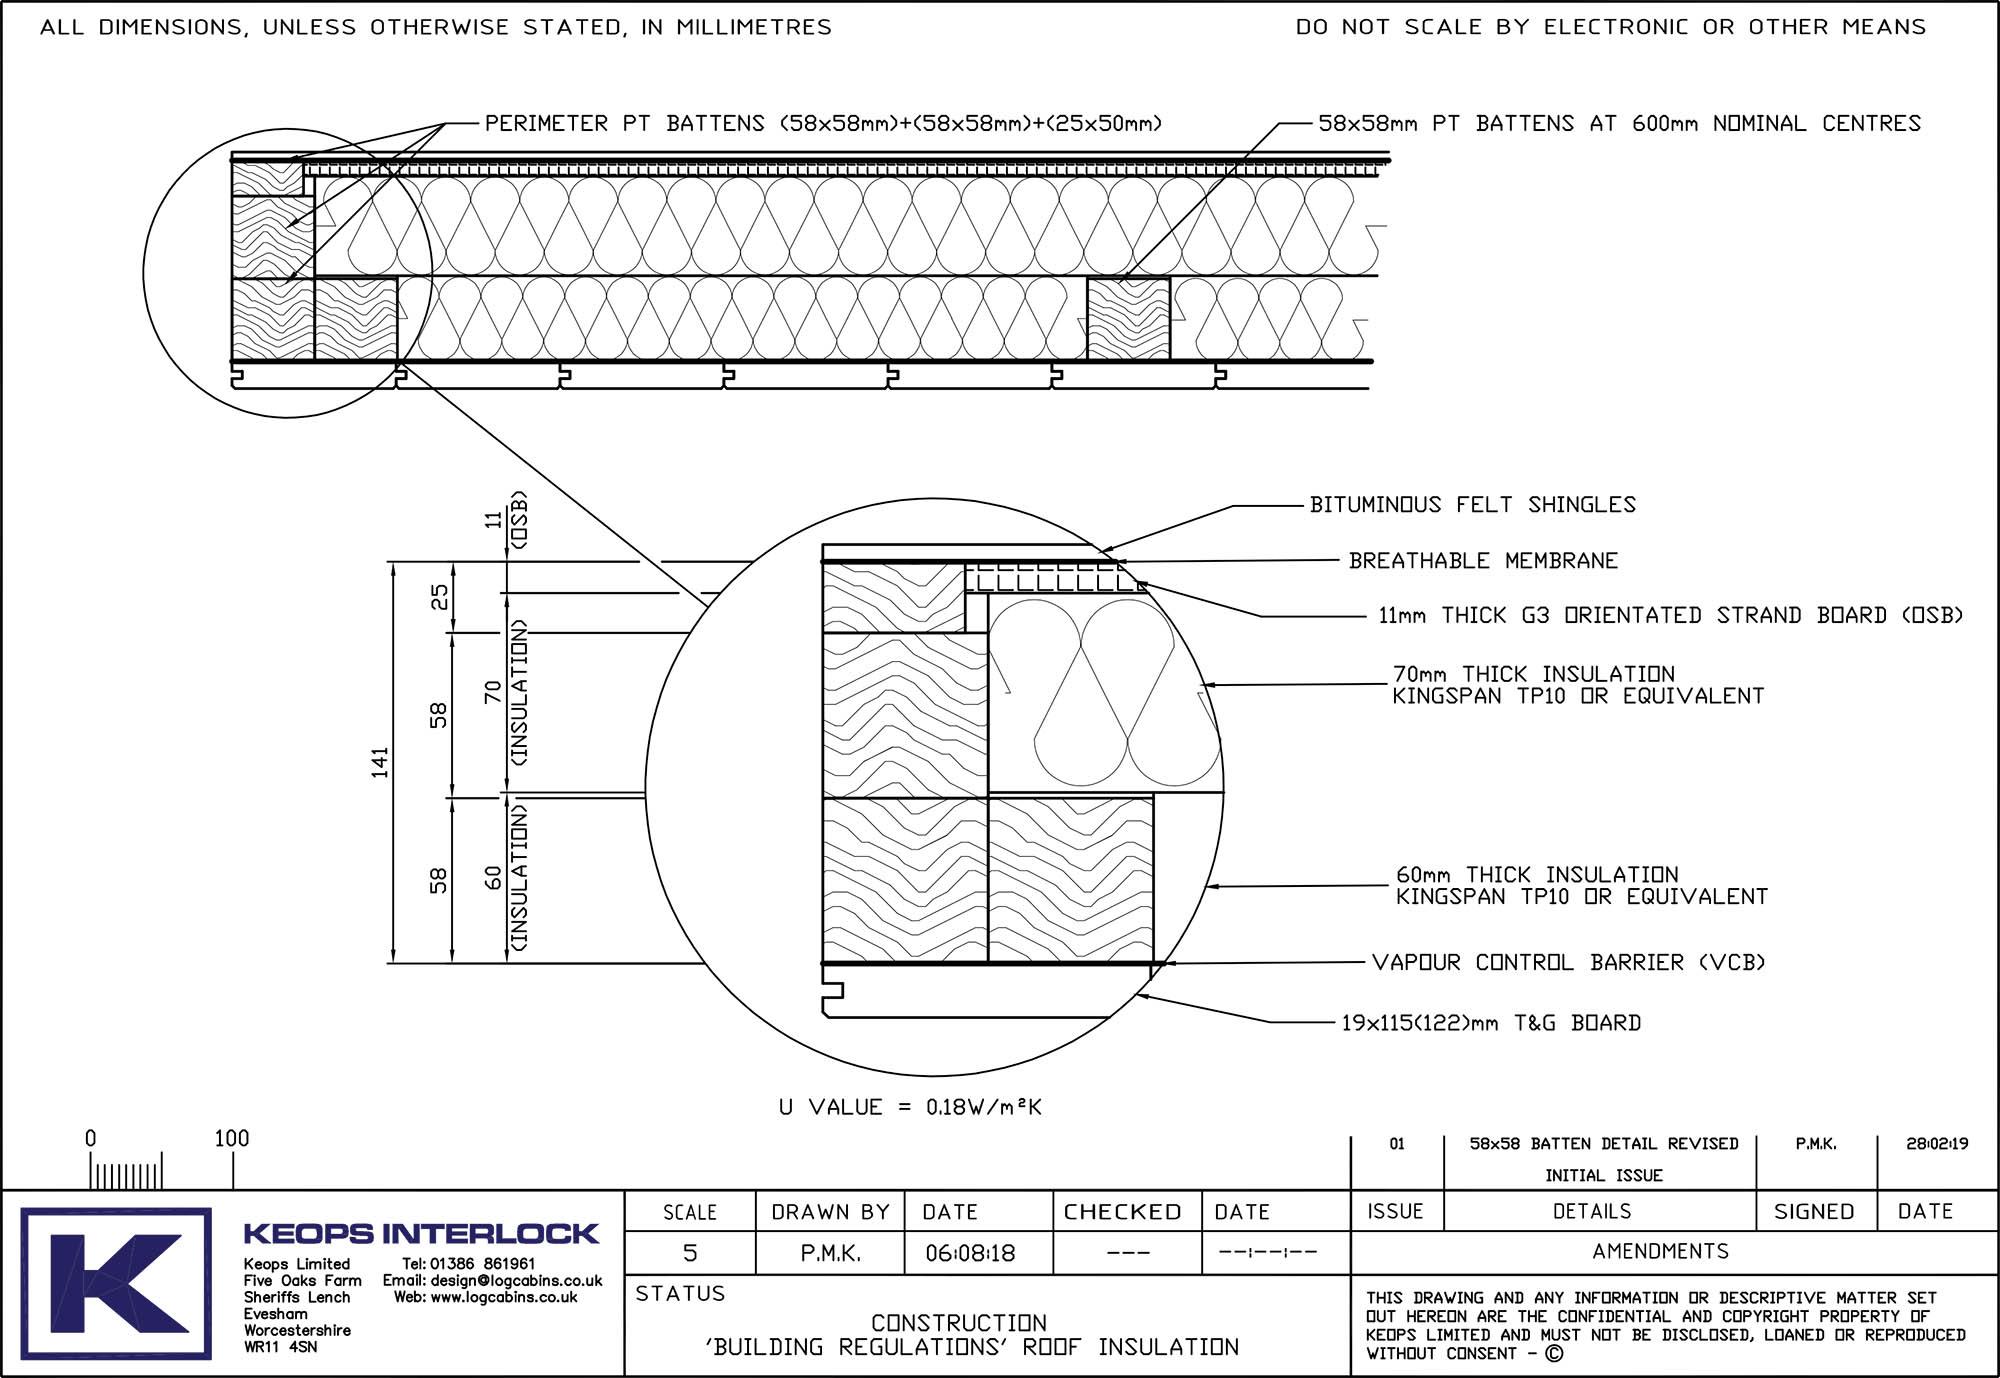 Keops Interlock Building Regulations roof insulation for log cabins